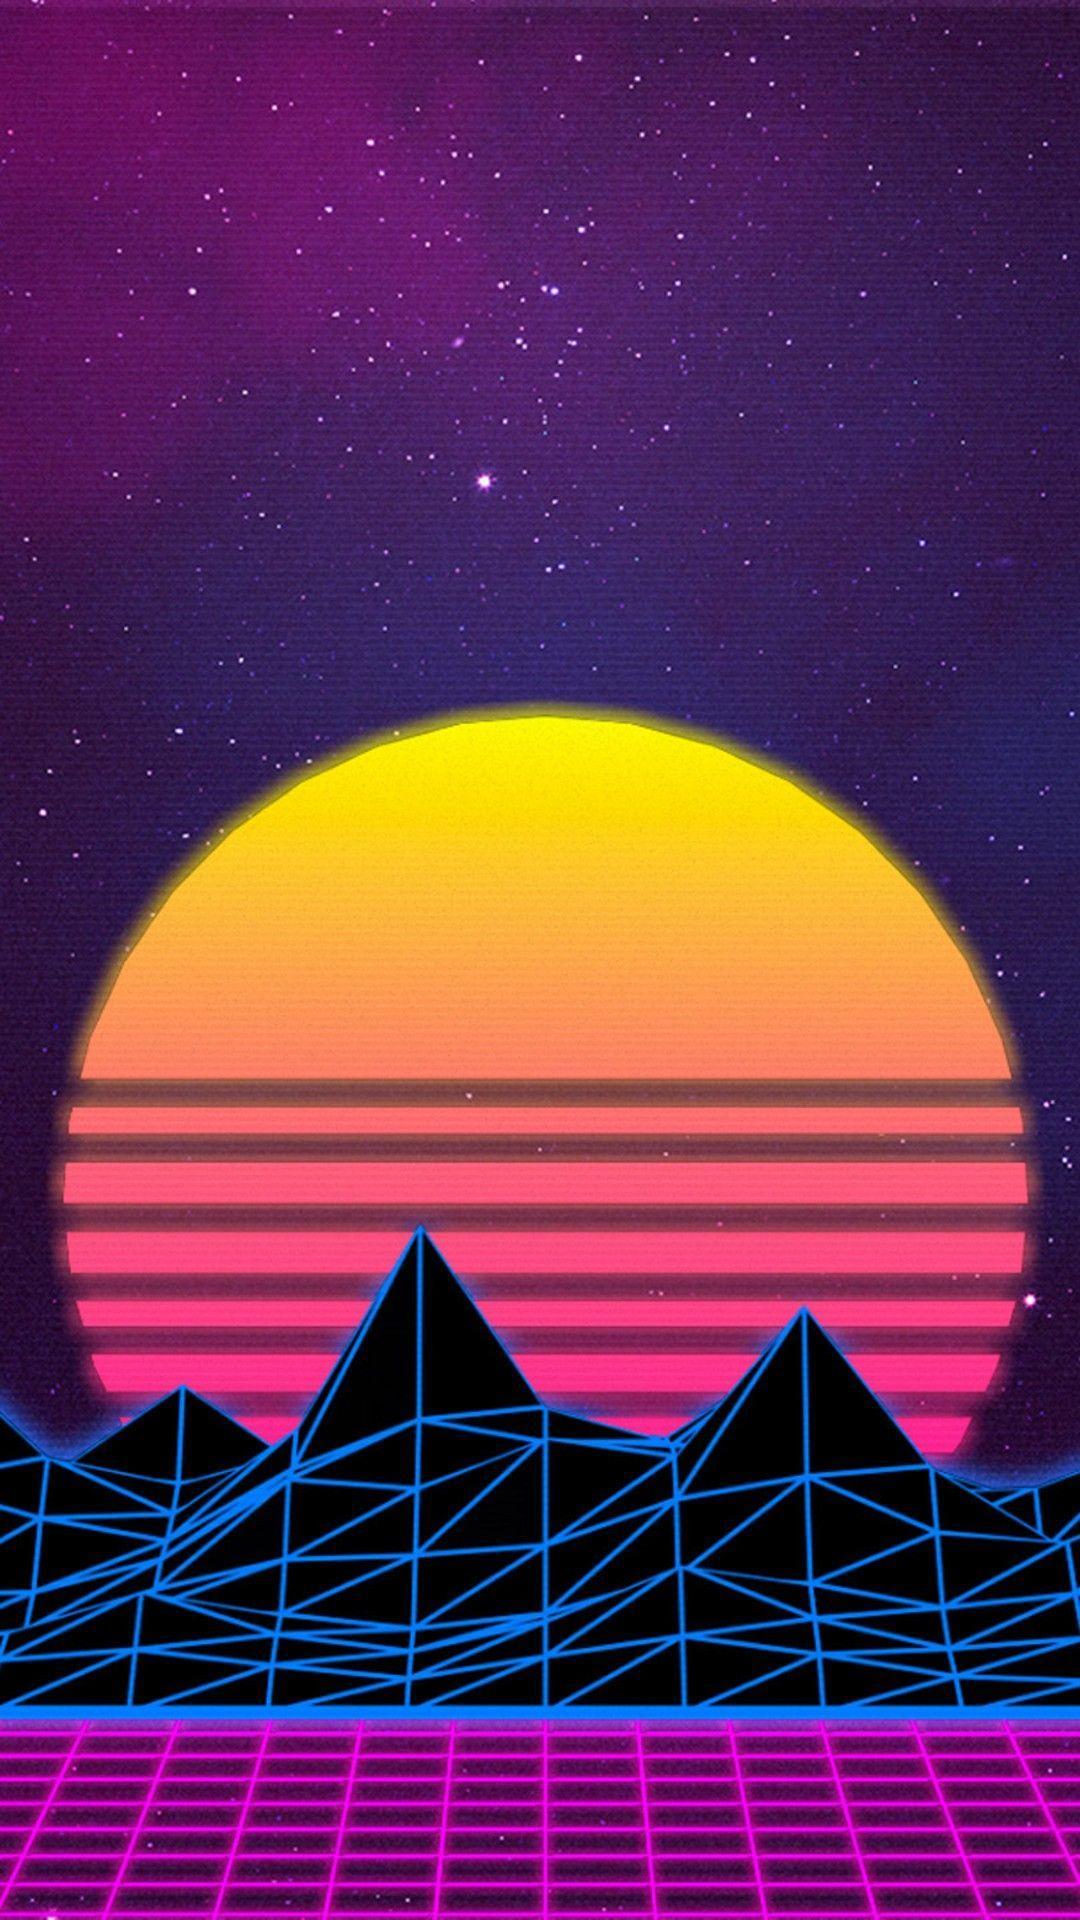 Retro Phone Wallpapers - Top Free Retro